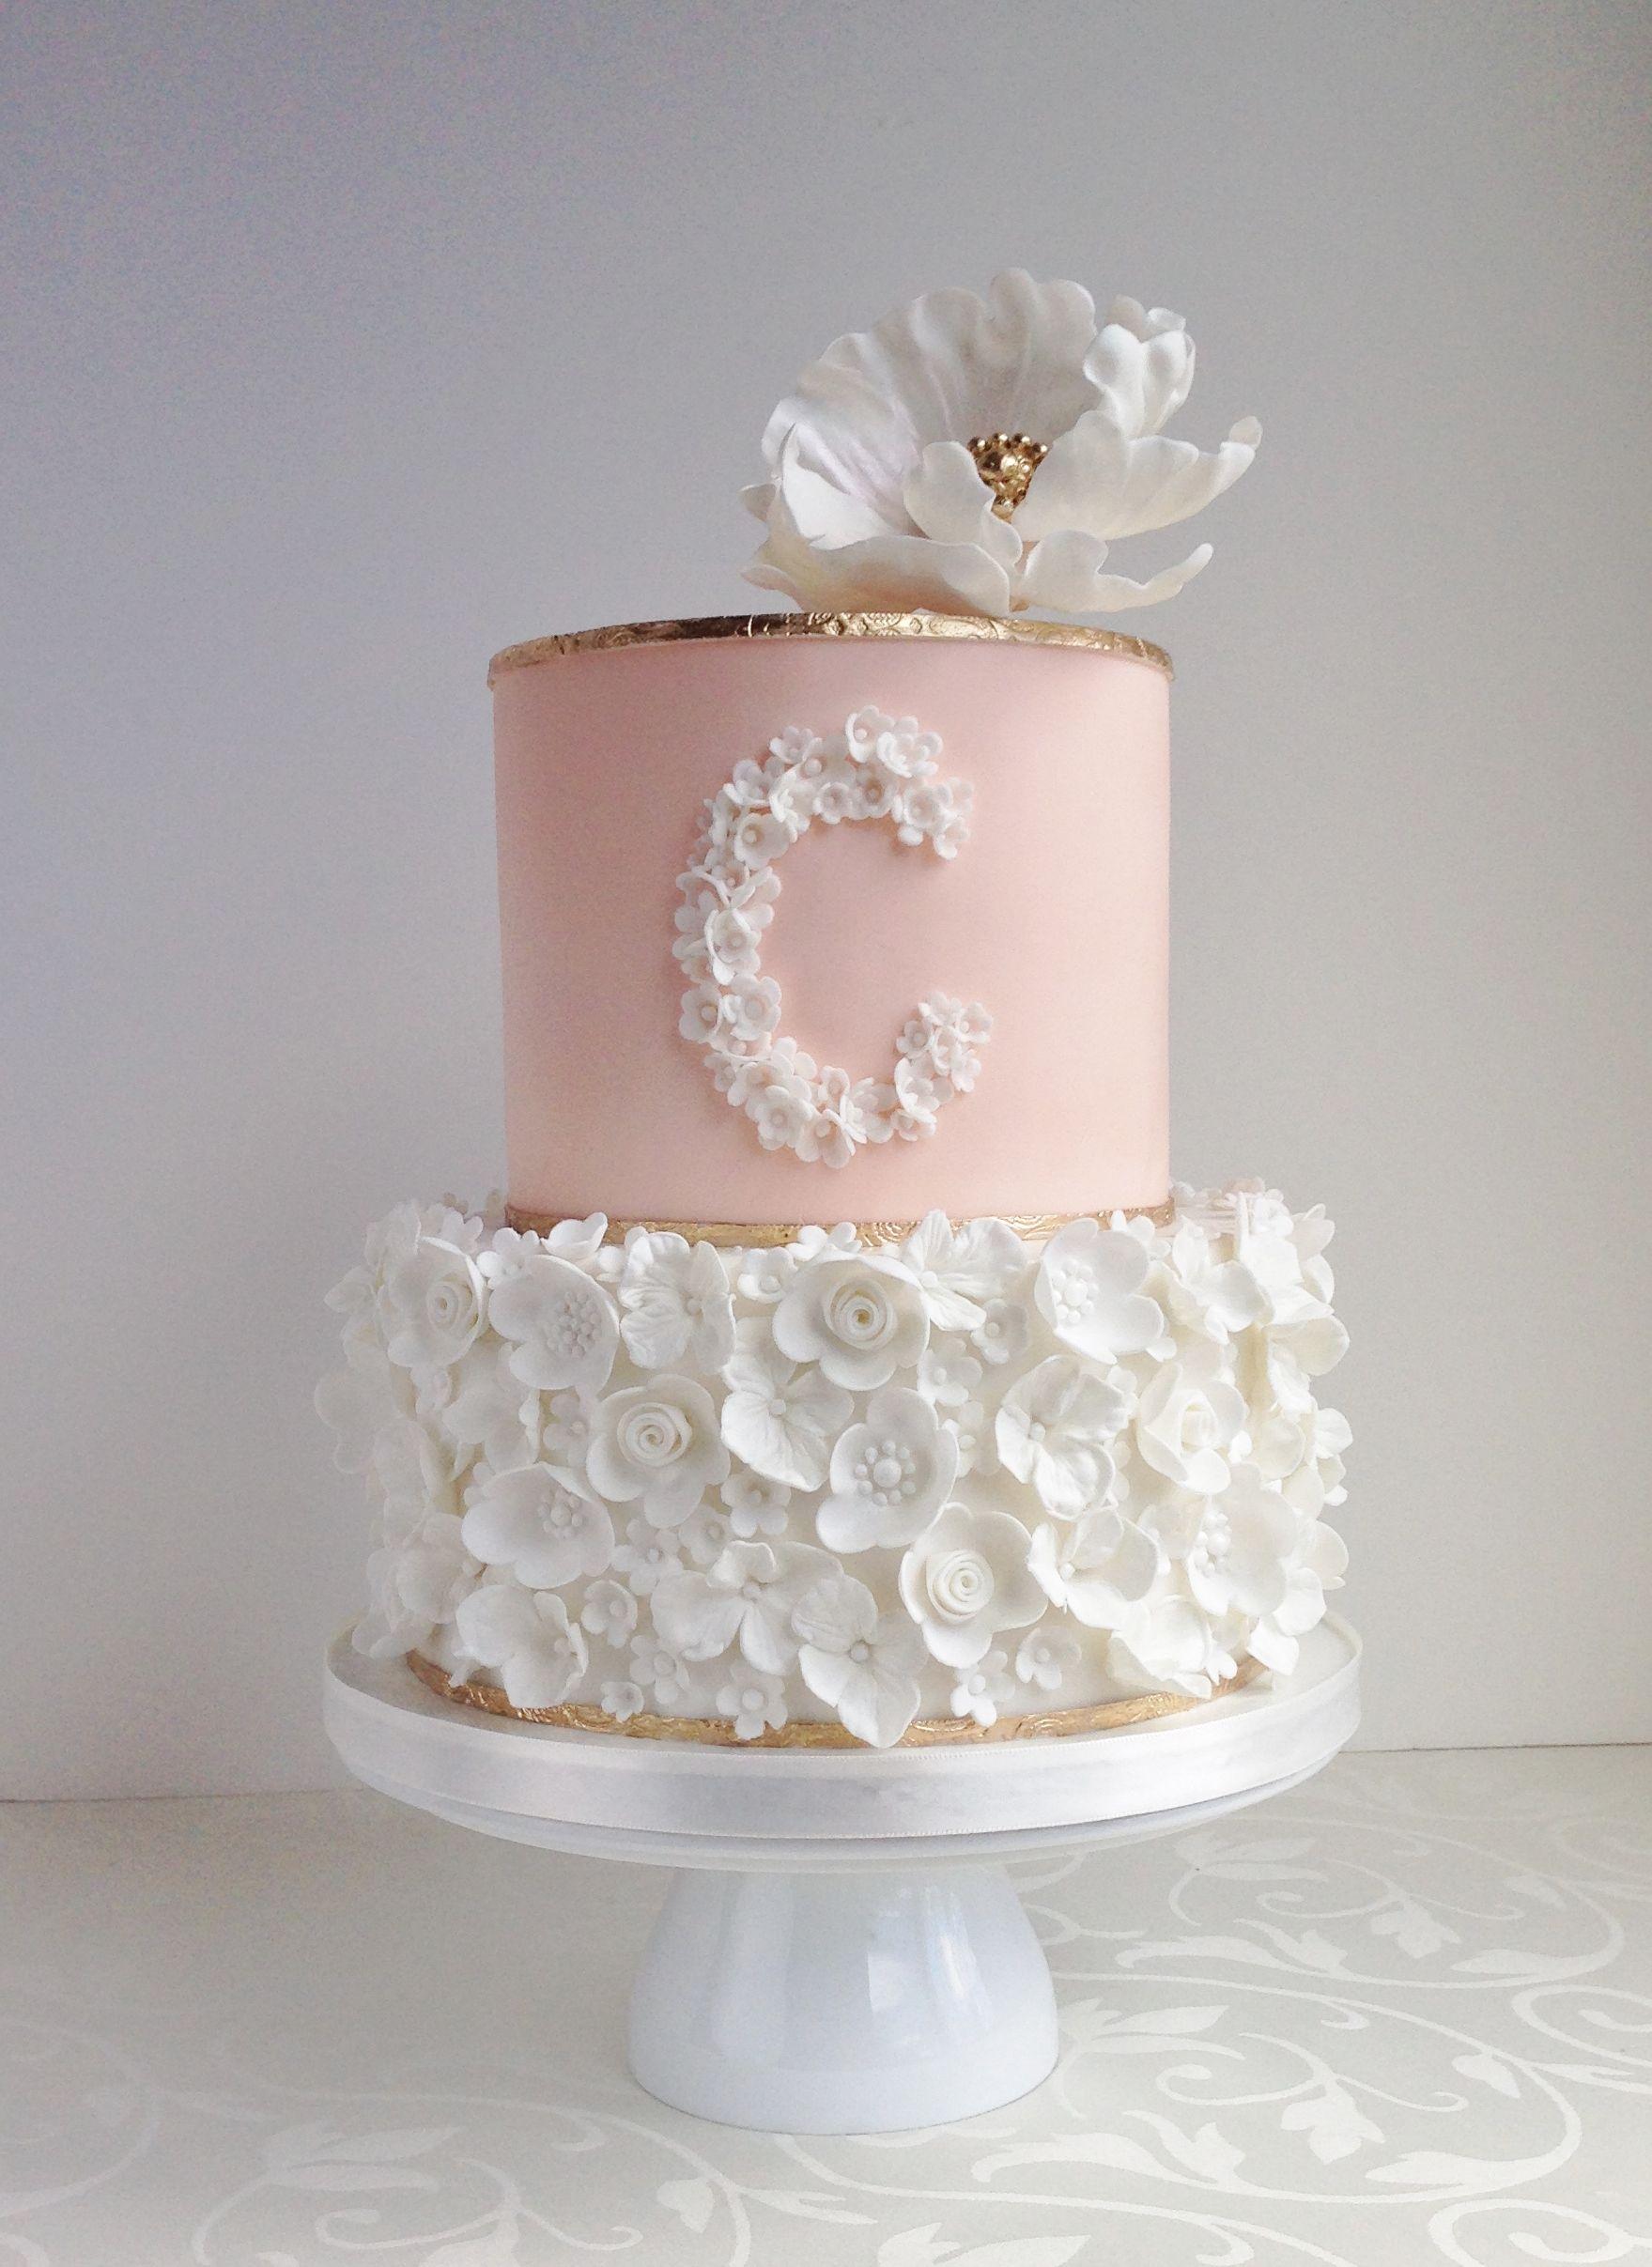 The cake whisperer cake designs cake and birthdays